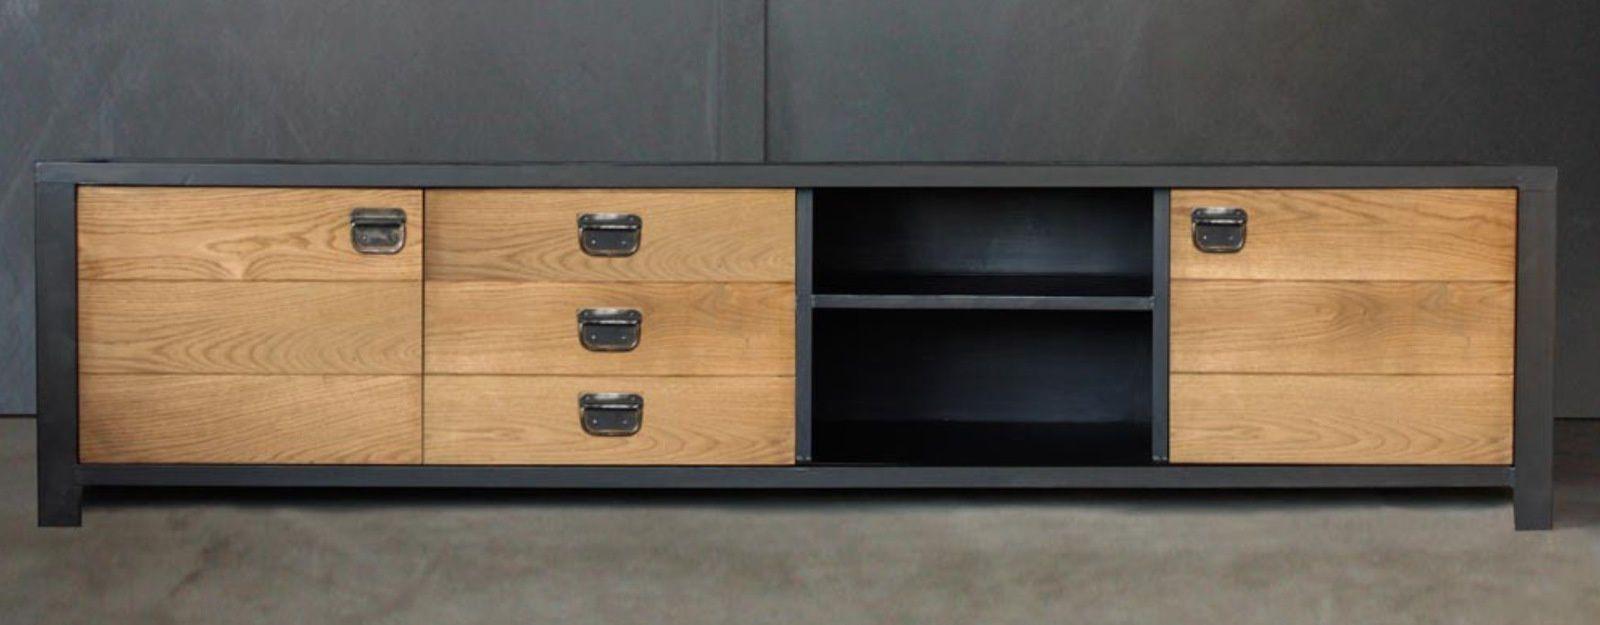 meuble tv industriel sur mesure www. Black Bedroom Furniture Sets. Home Design Ideas